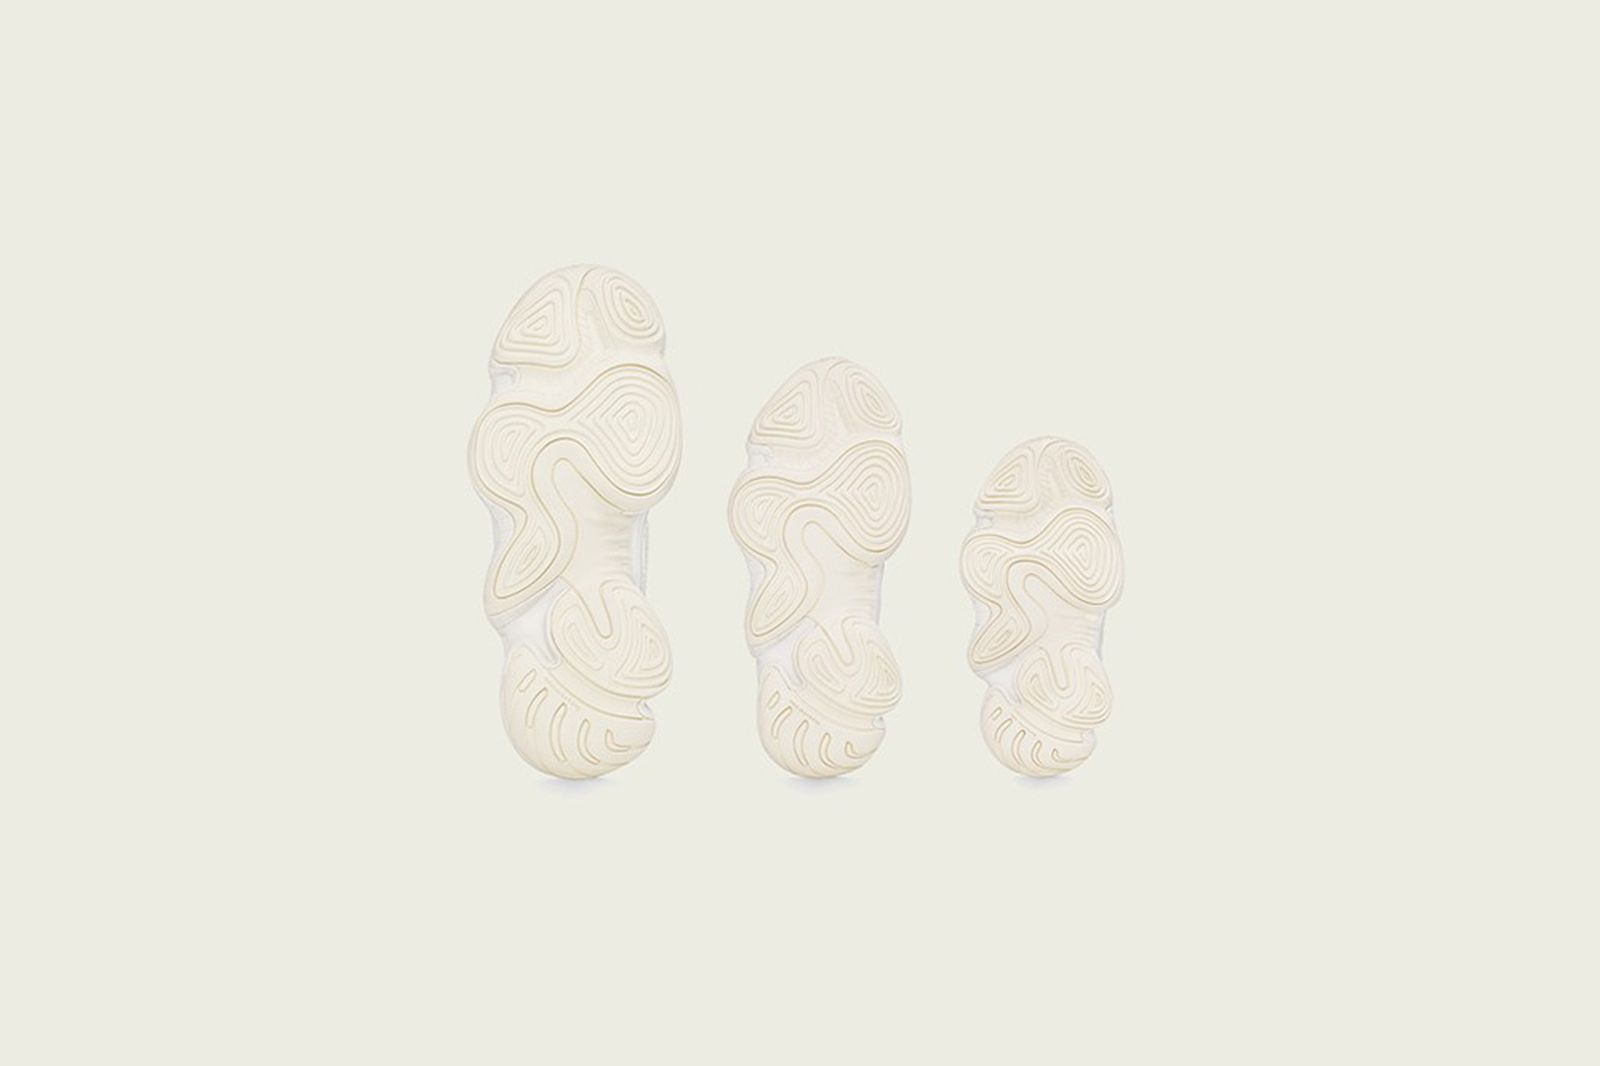 adidas yeezy 500 bone white release date price kanye west